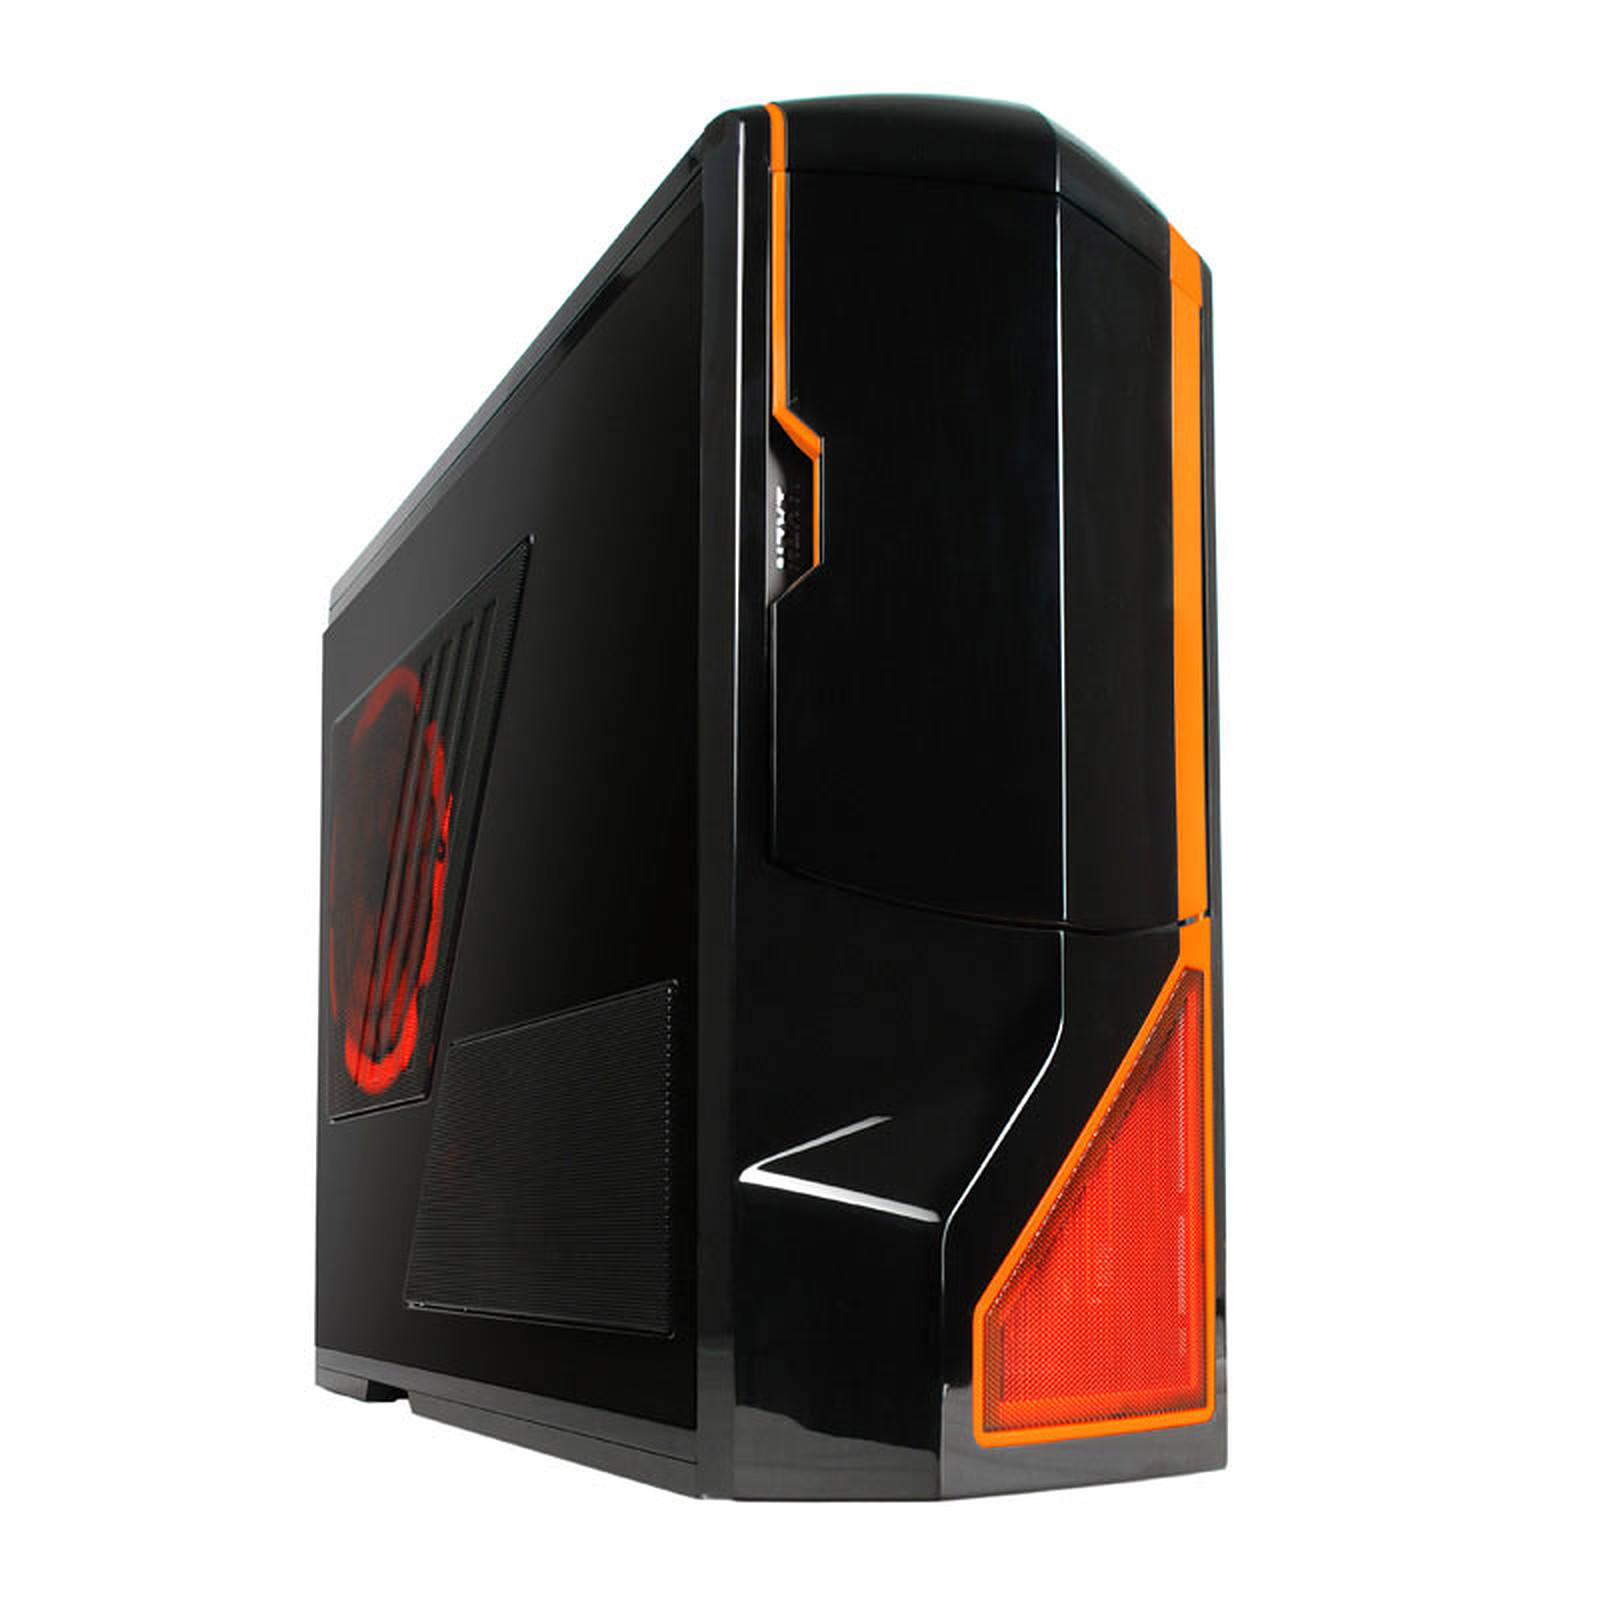 LDLC PC10 Revolution Limited Edition Orange